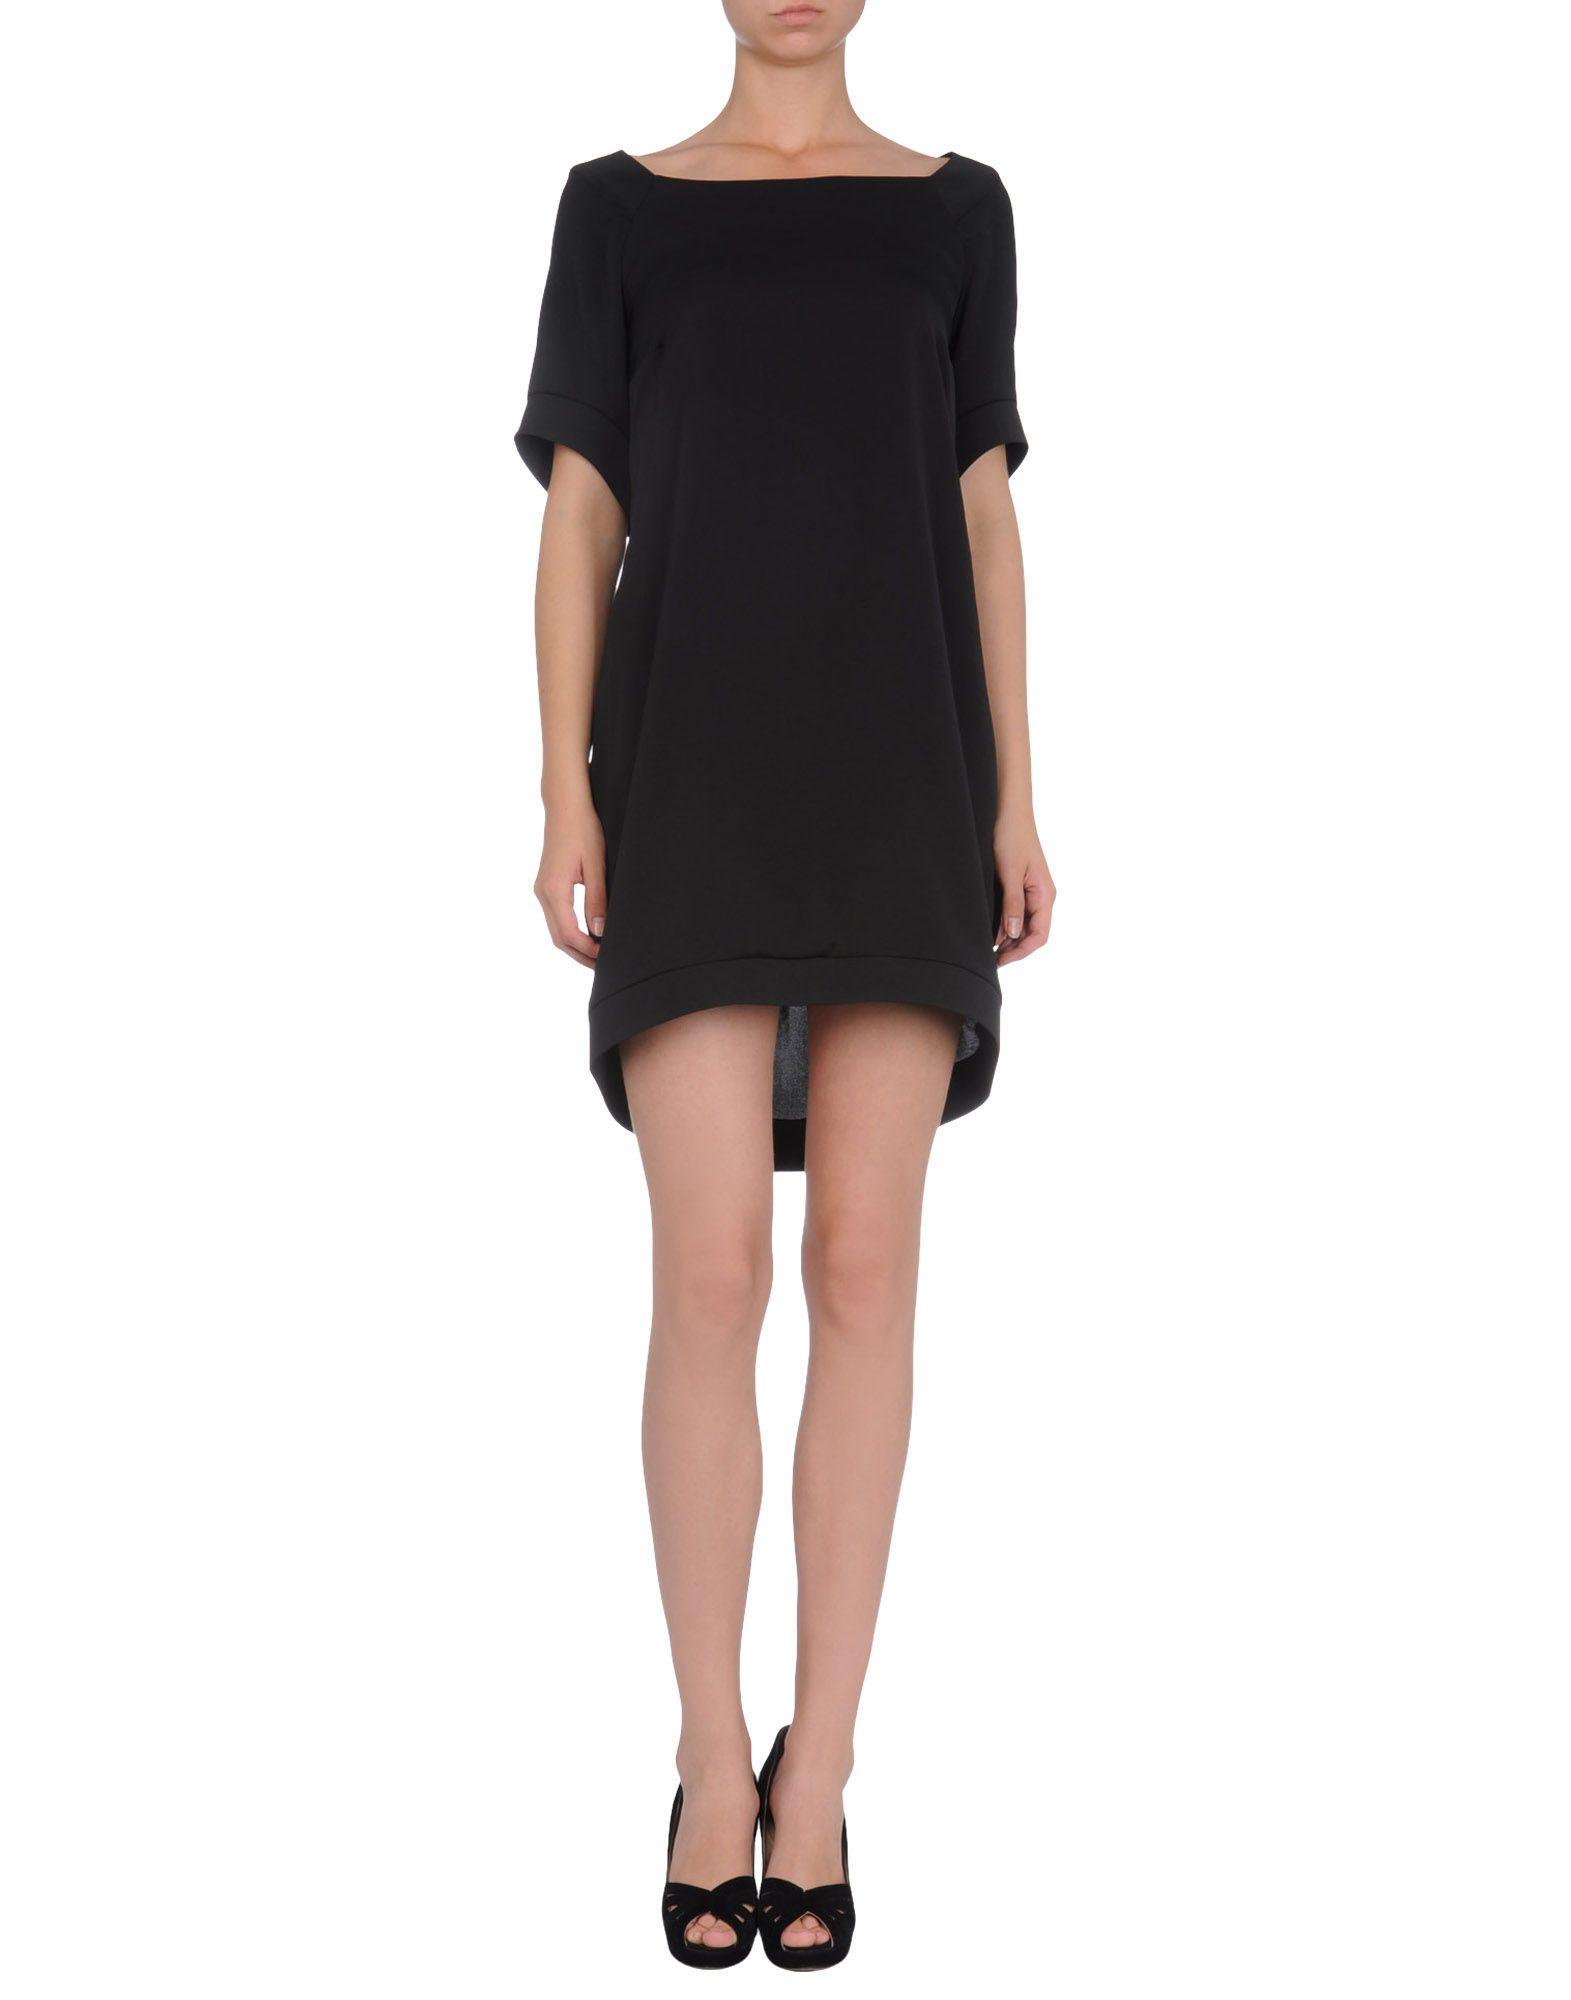 PATRIZIA PEPE Women - Dresses - Short dress PATRIZIA PEPE on YOOX United States